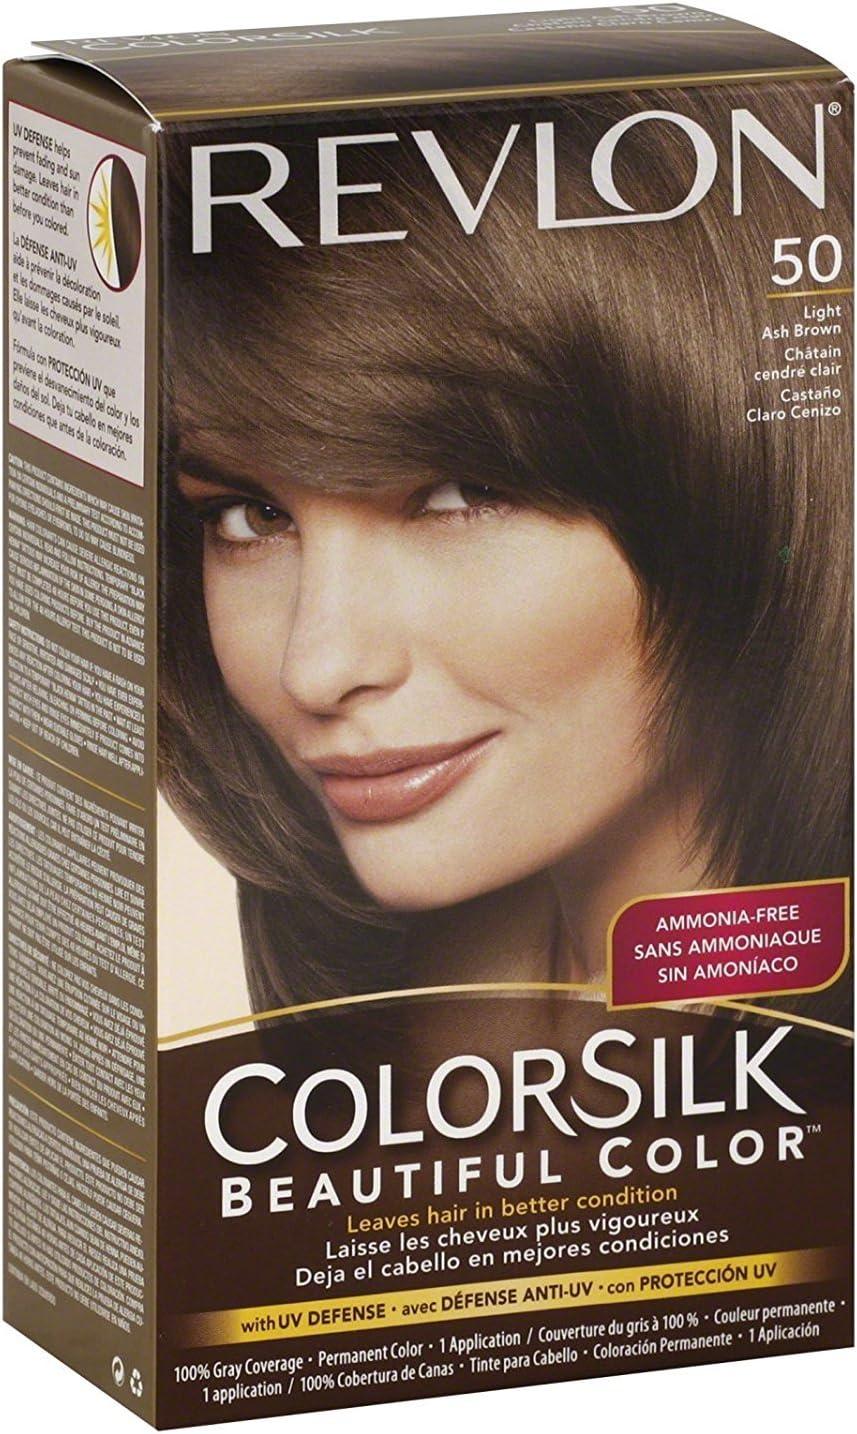 Colorsilk By Revlon, Haircolor: Light Ash Brown ? 1ea: Amazon ...